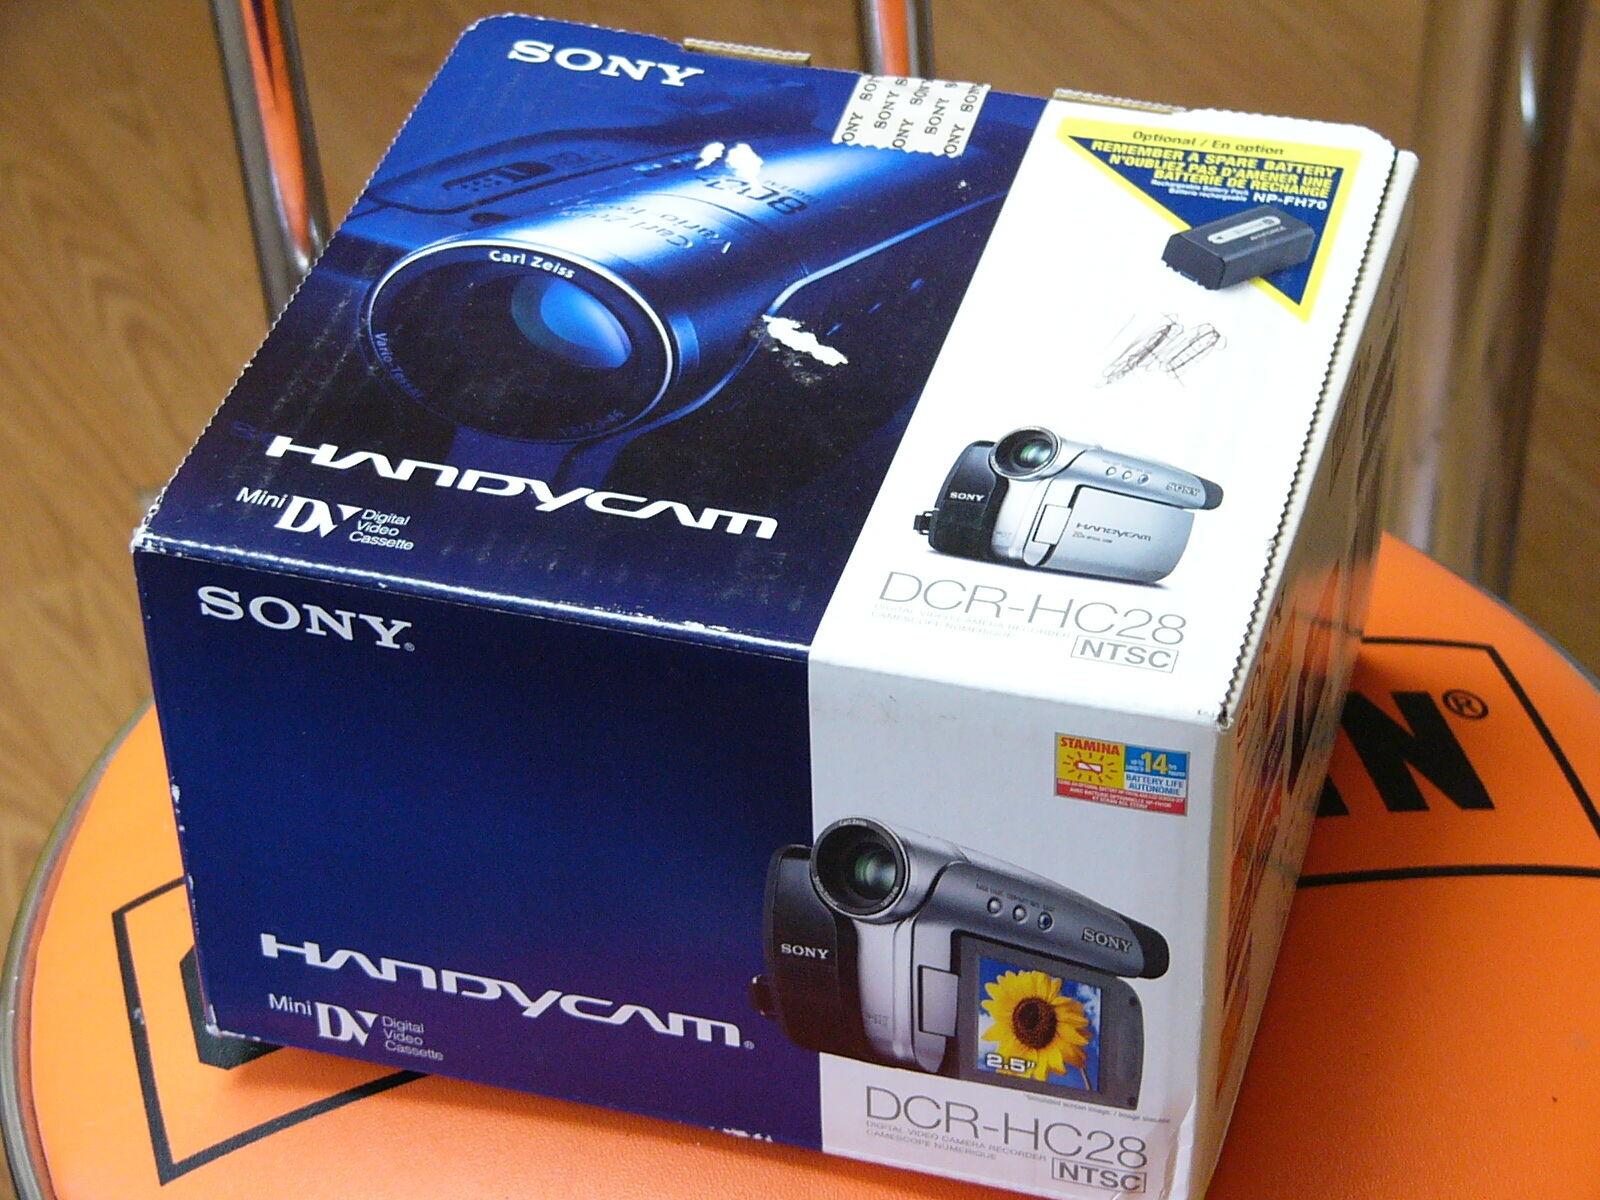 sony handycam dcr hc28 mini dv camcorder ebay rh ebay com Sony Handycam Instruction Manual Sony Handycam Digital 8 Camcorder